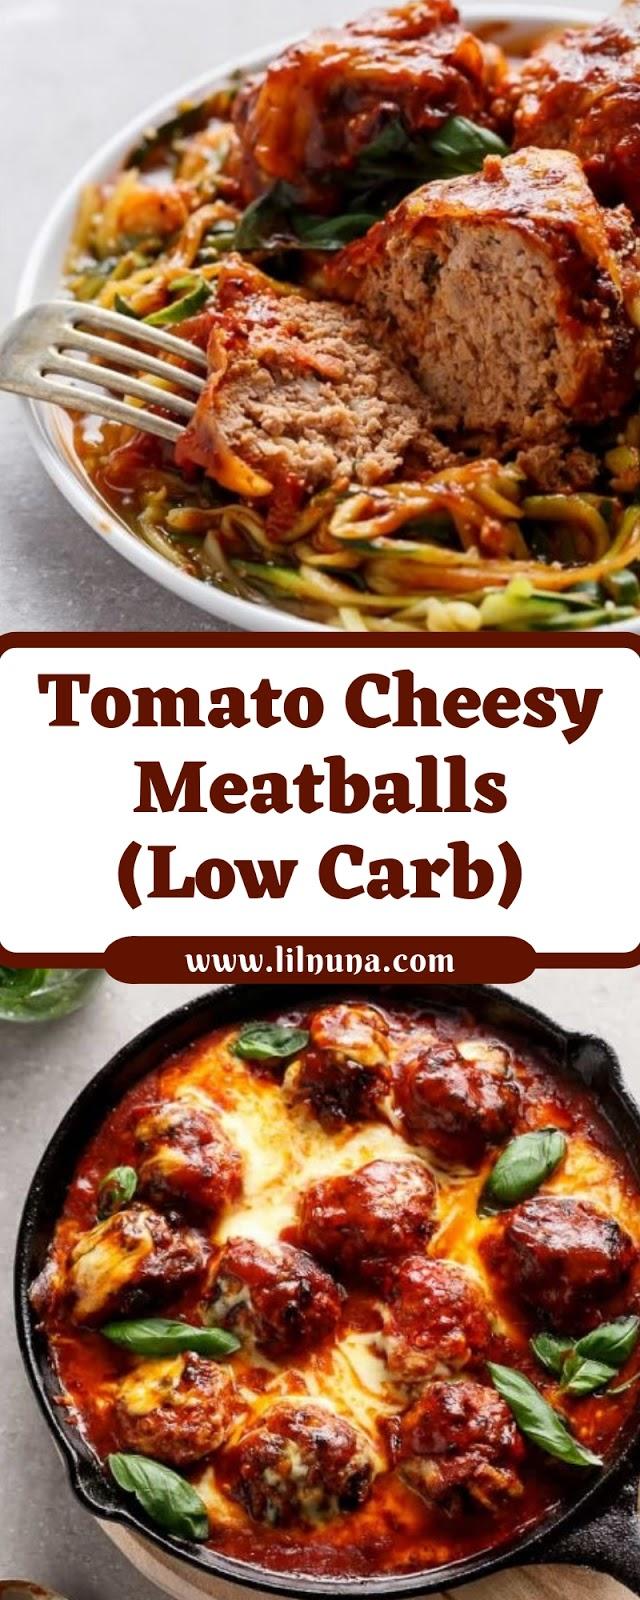 Tomato Cheesy Meatballs (Low Carb)